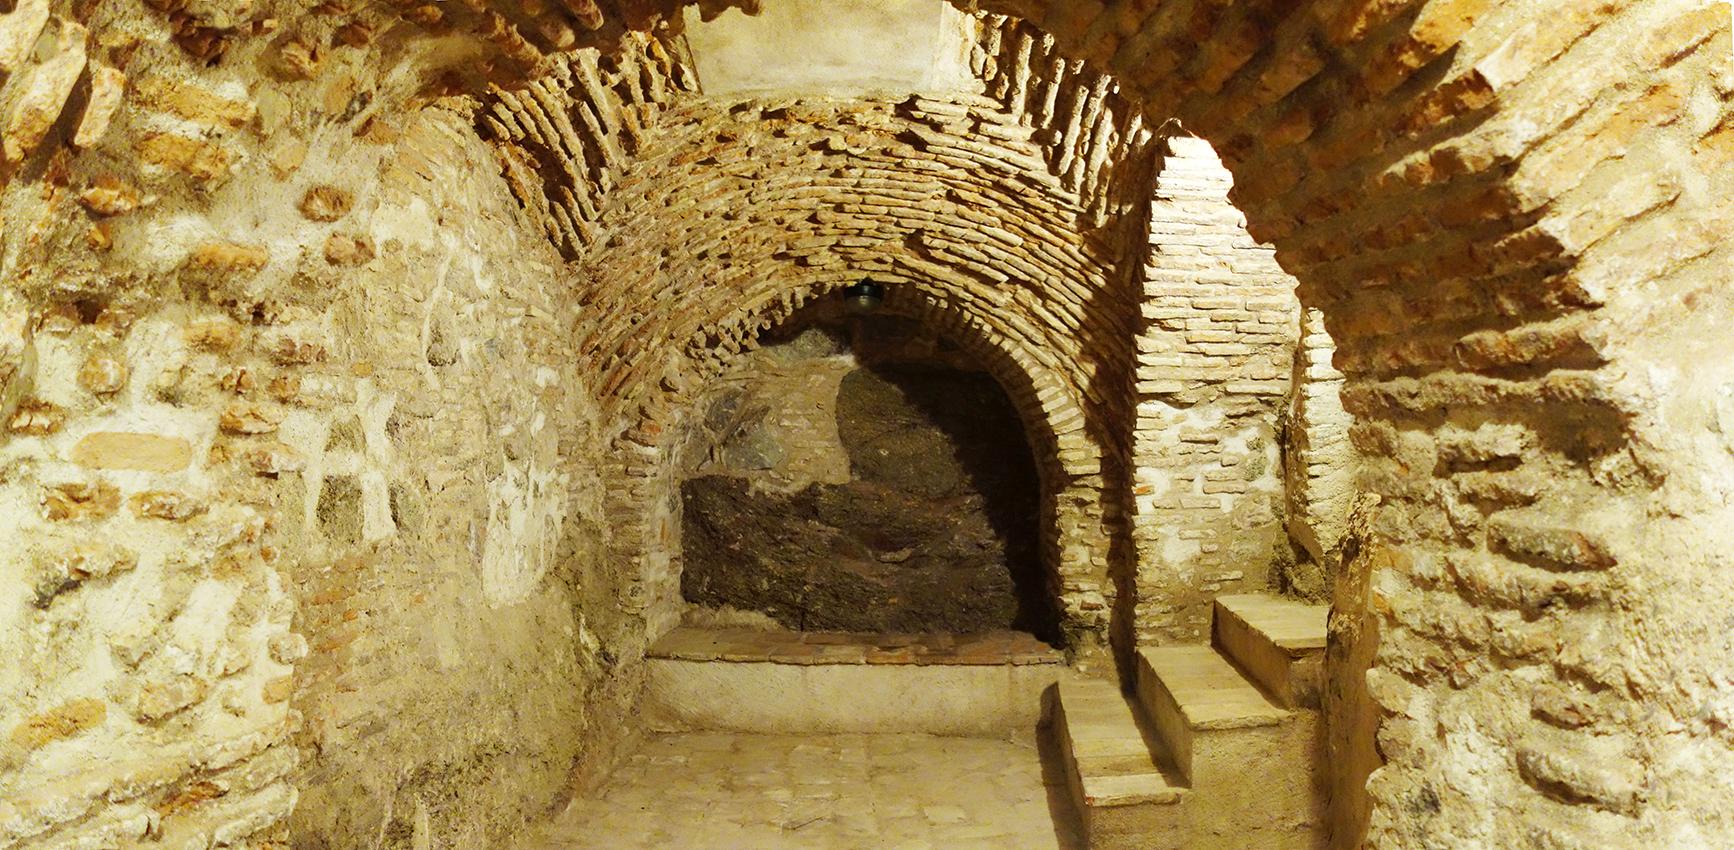 Baño ritual judío, Callejón del Verde. Toledo